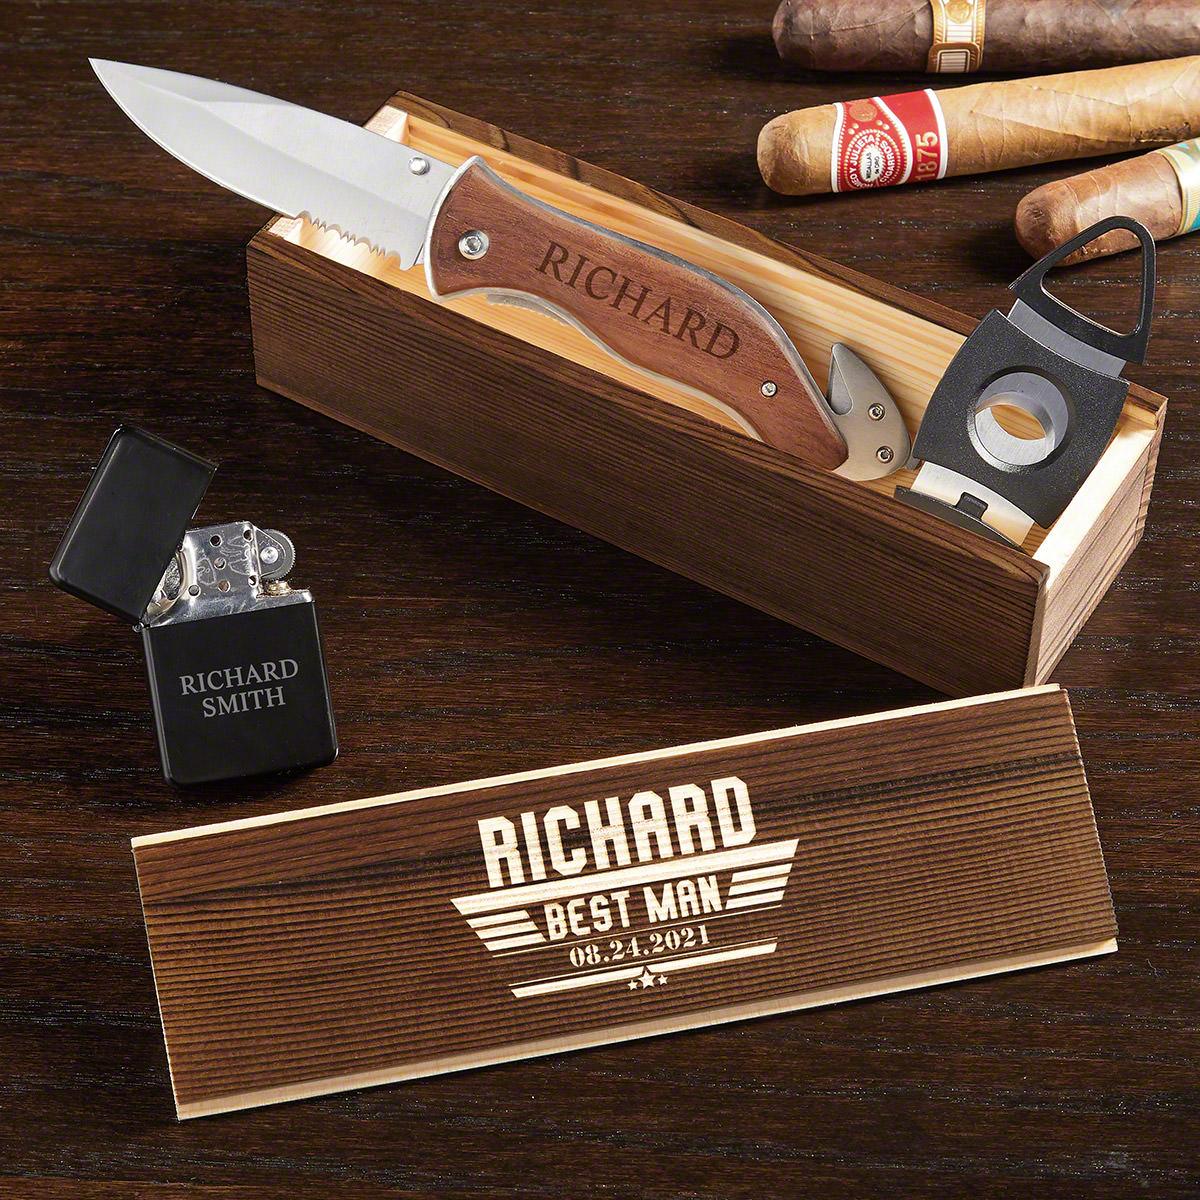 Maverick-Personalized-Cigar-Box-Set-Gifts-for-Groomsmen